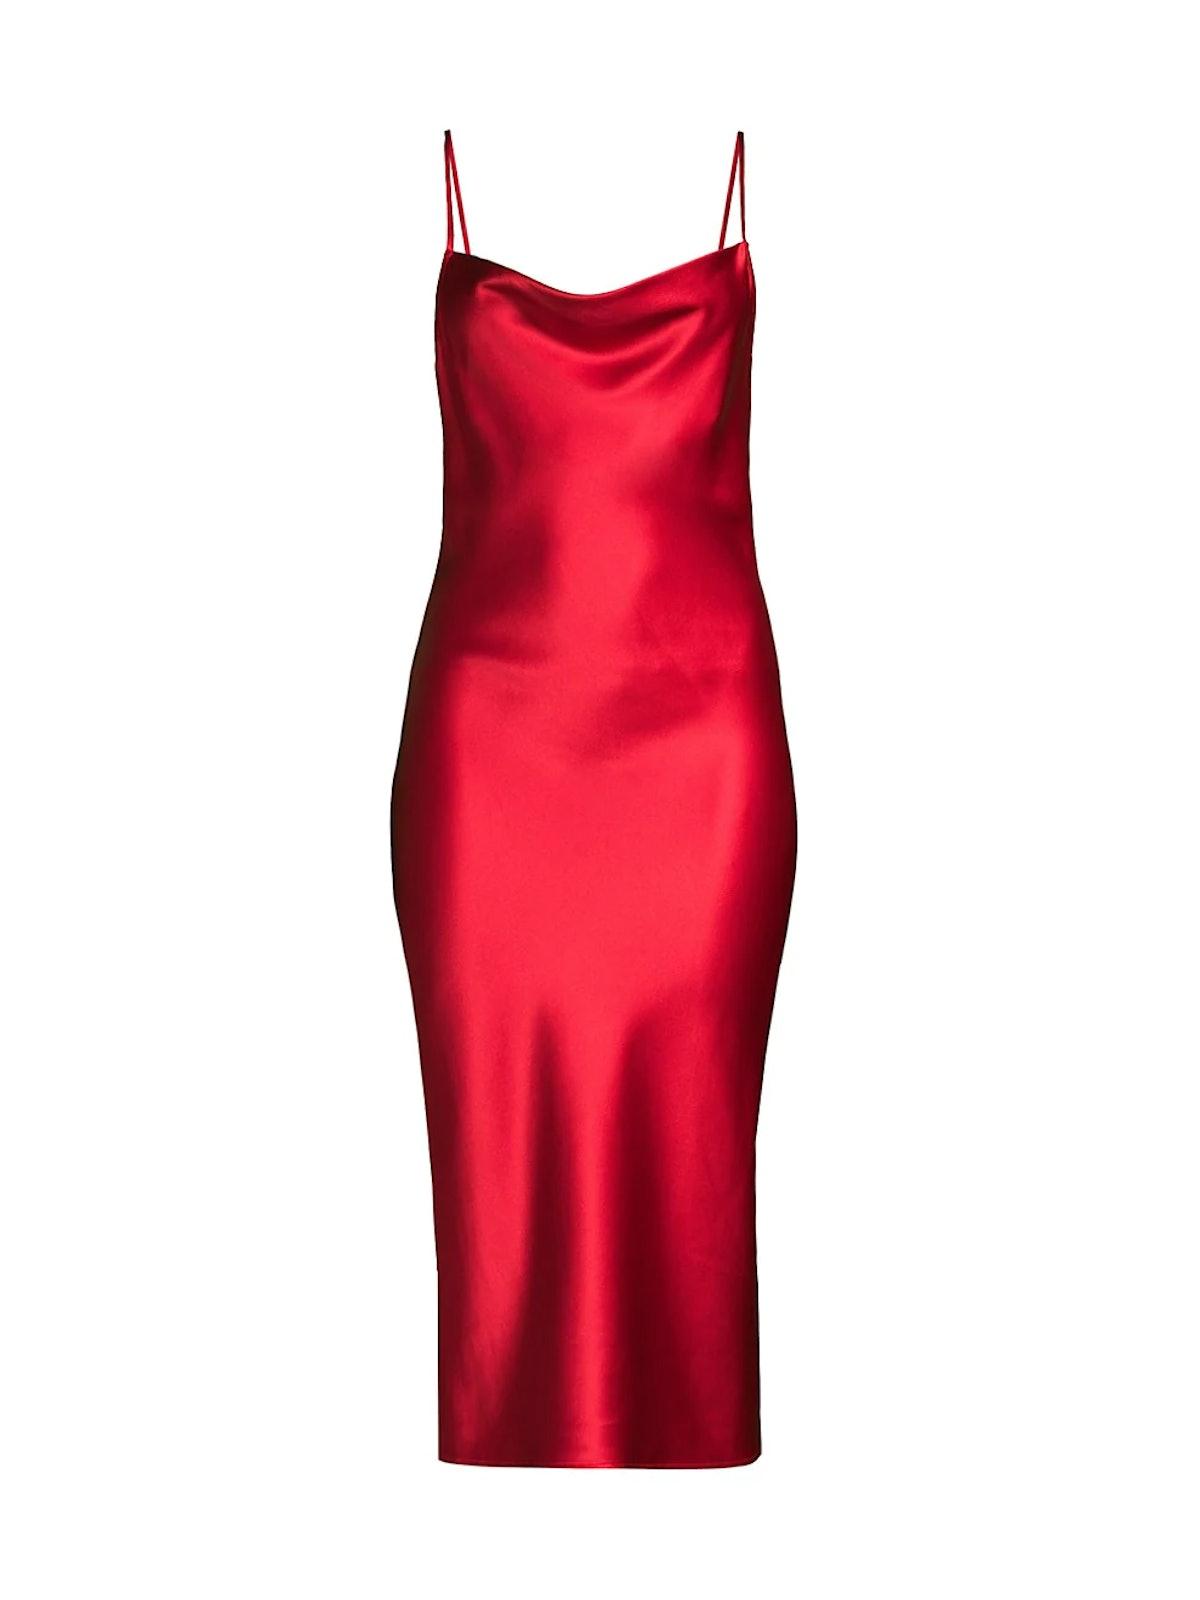 Cowl High Slit Silk Slip Dress from Fleur du Mal, available to shop on Saks Fifth Avenue.